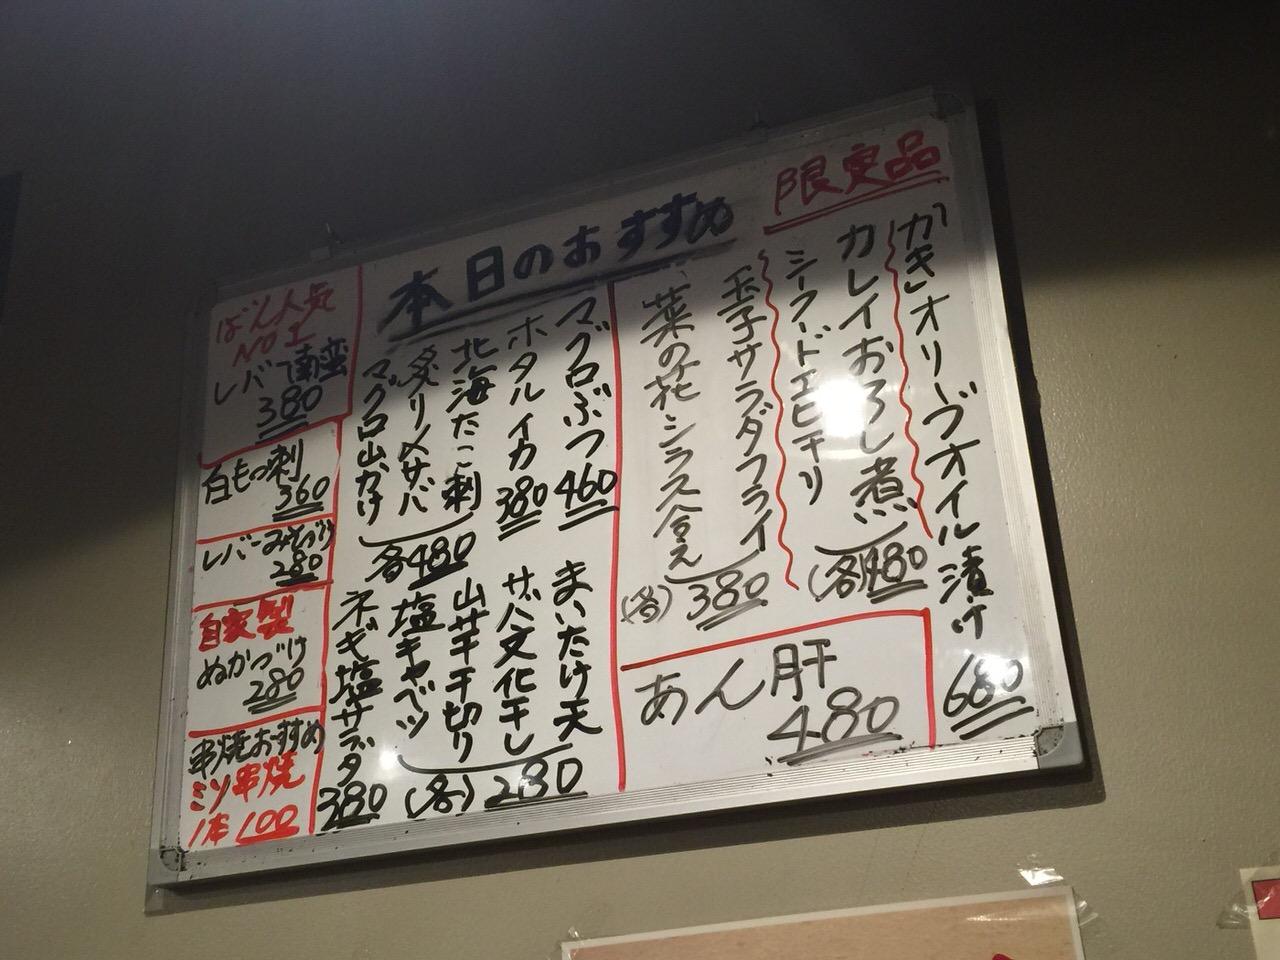 Nakameguro ban 2344